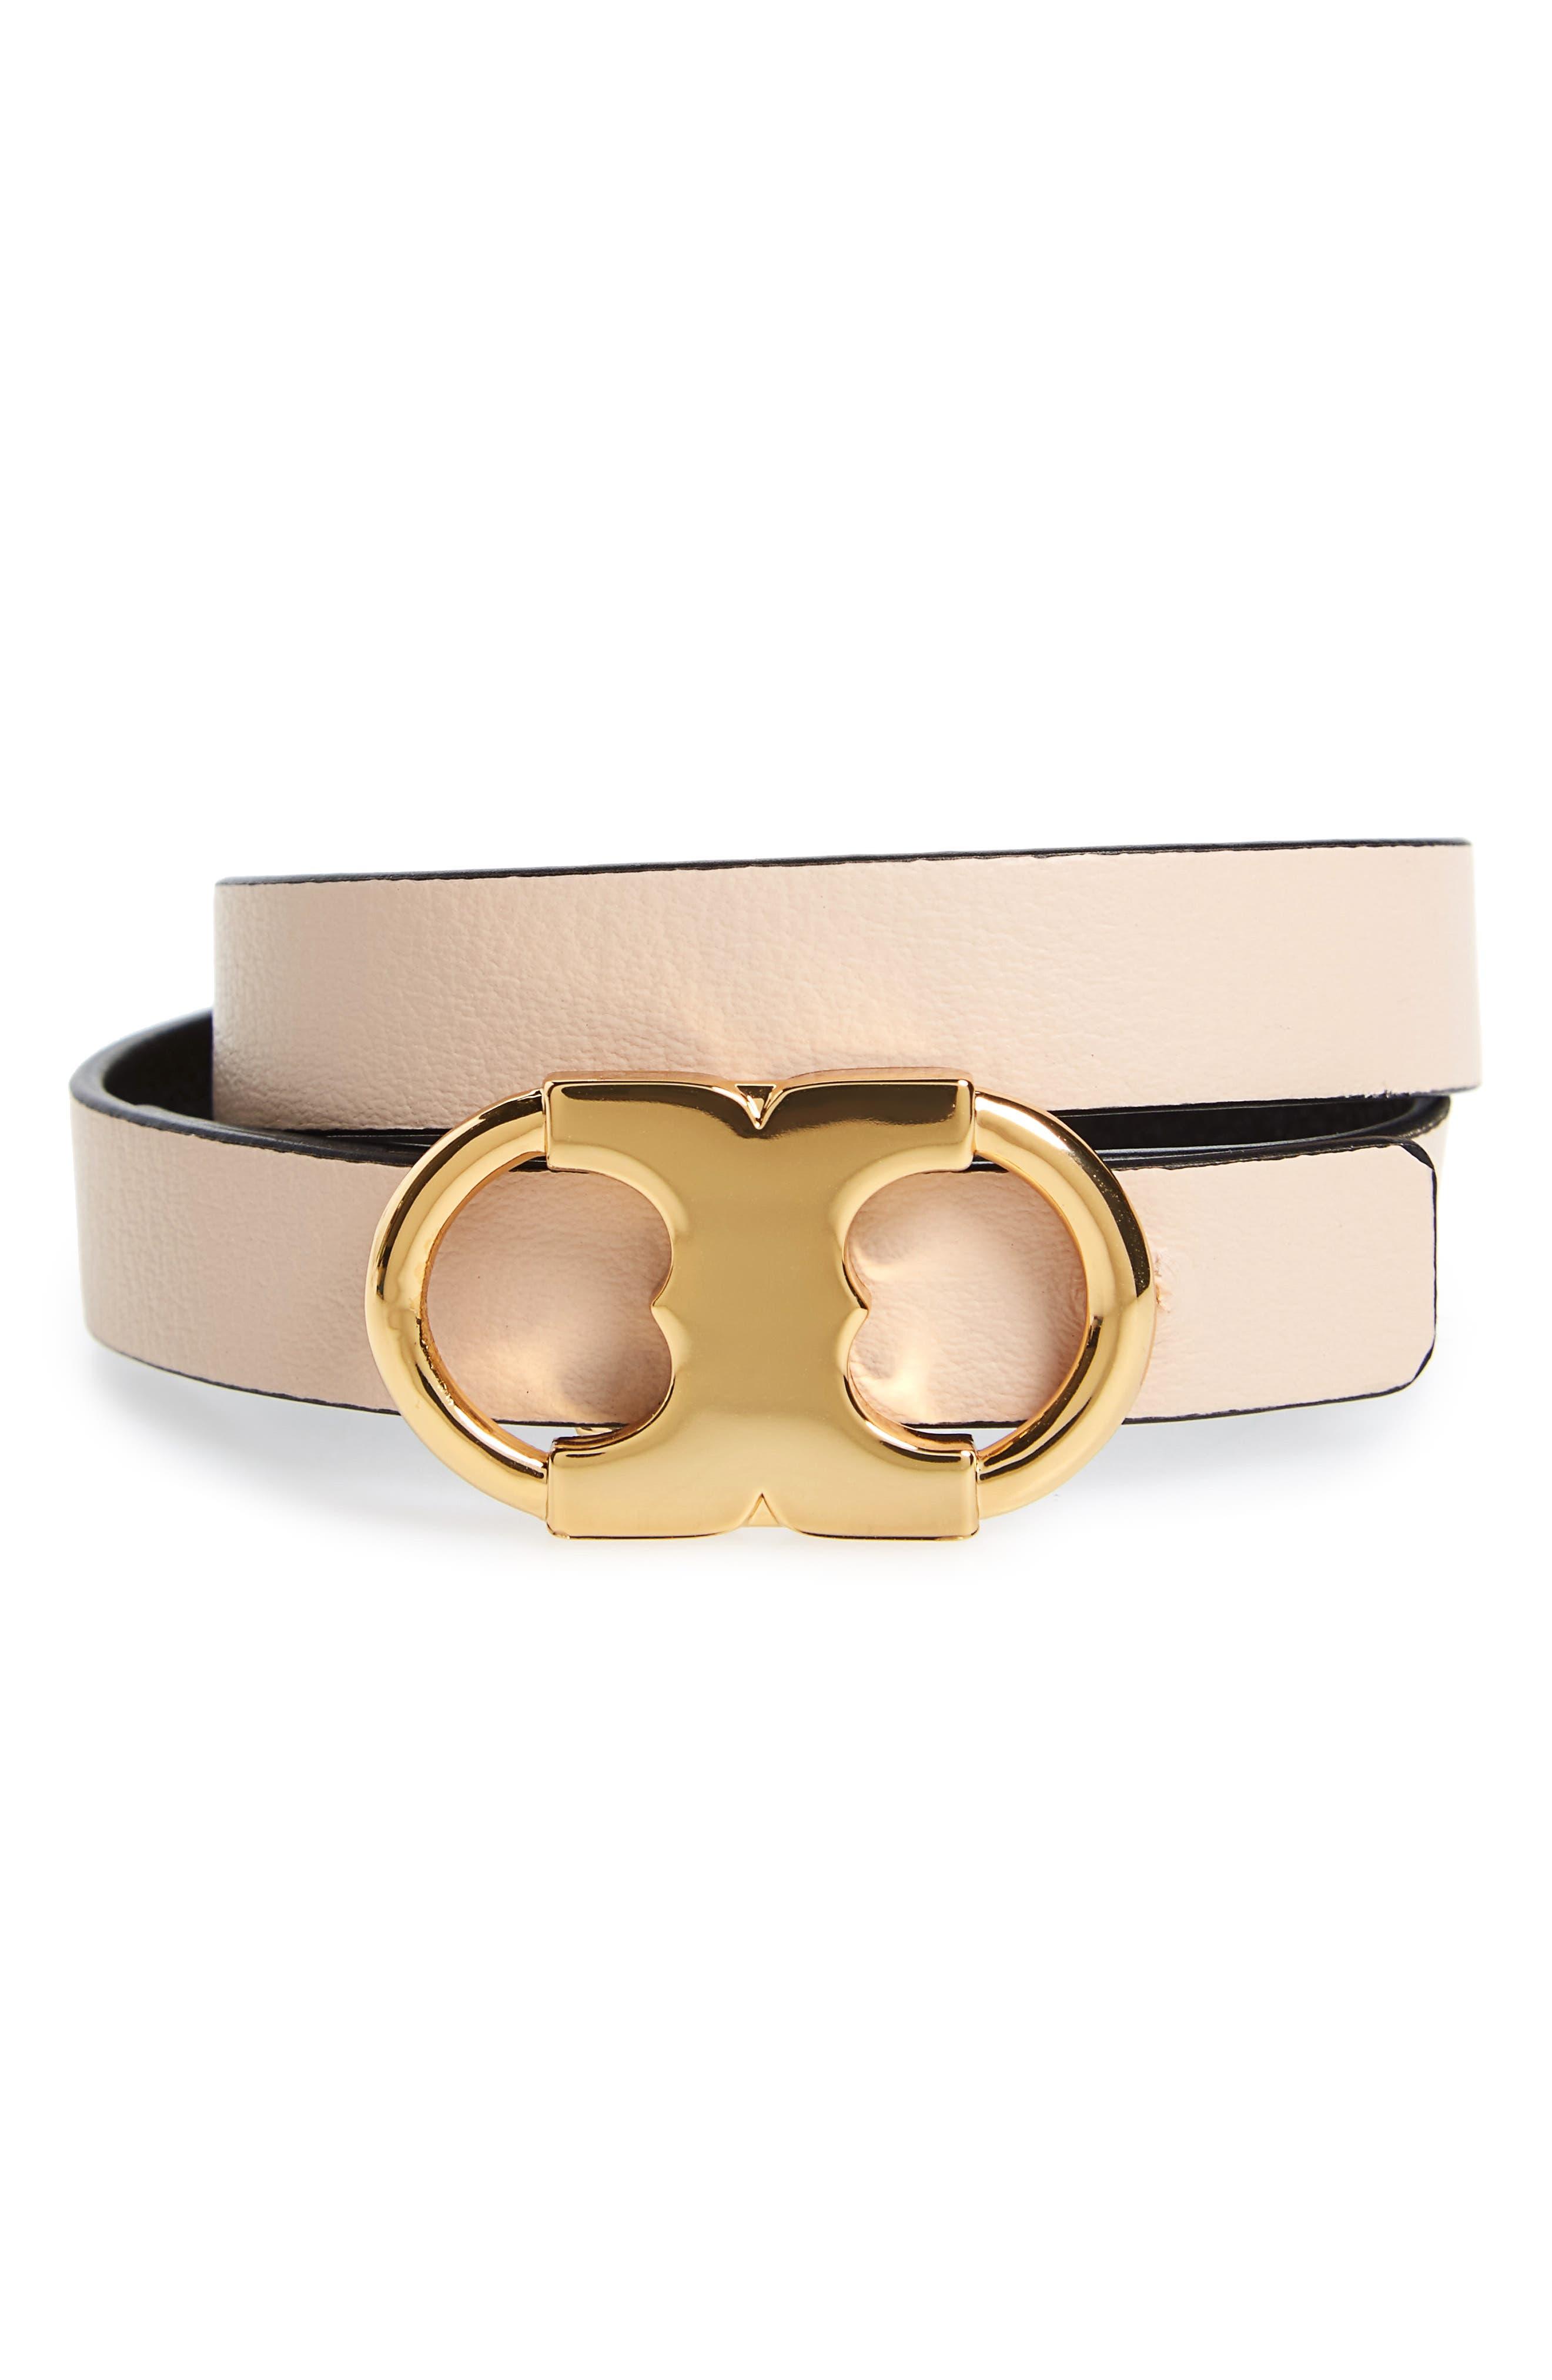 Gemini Link Reversible Wrap Bracelet,                             Alternate thumbnail 2, color,                             LIGHT OAK / BLACK / TORY GOLD